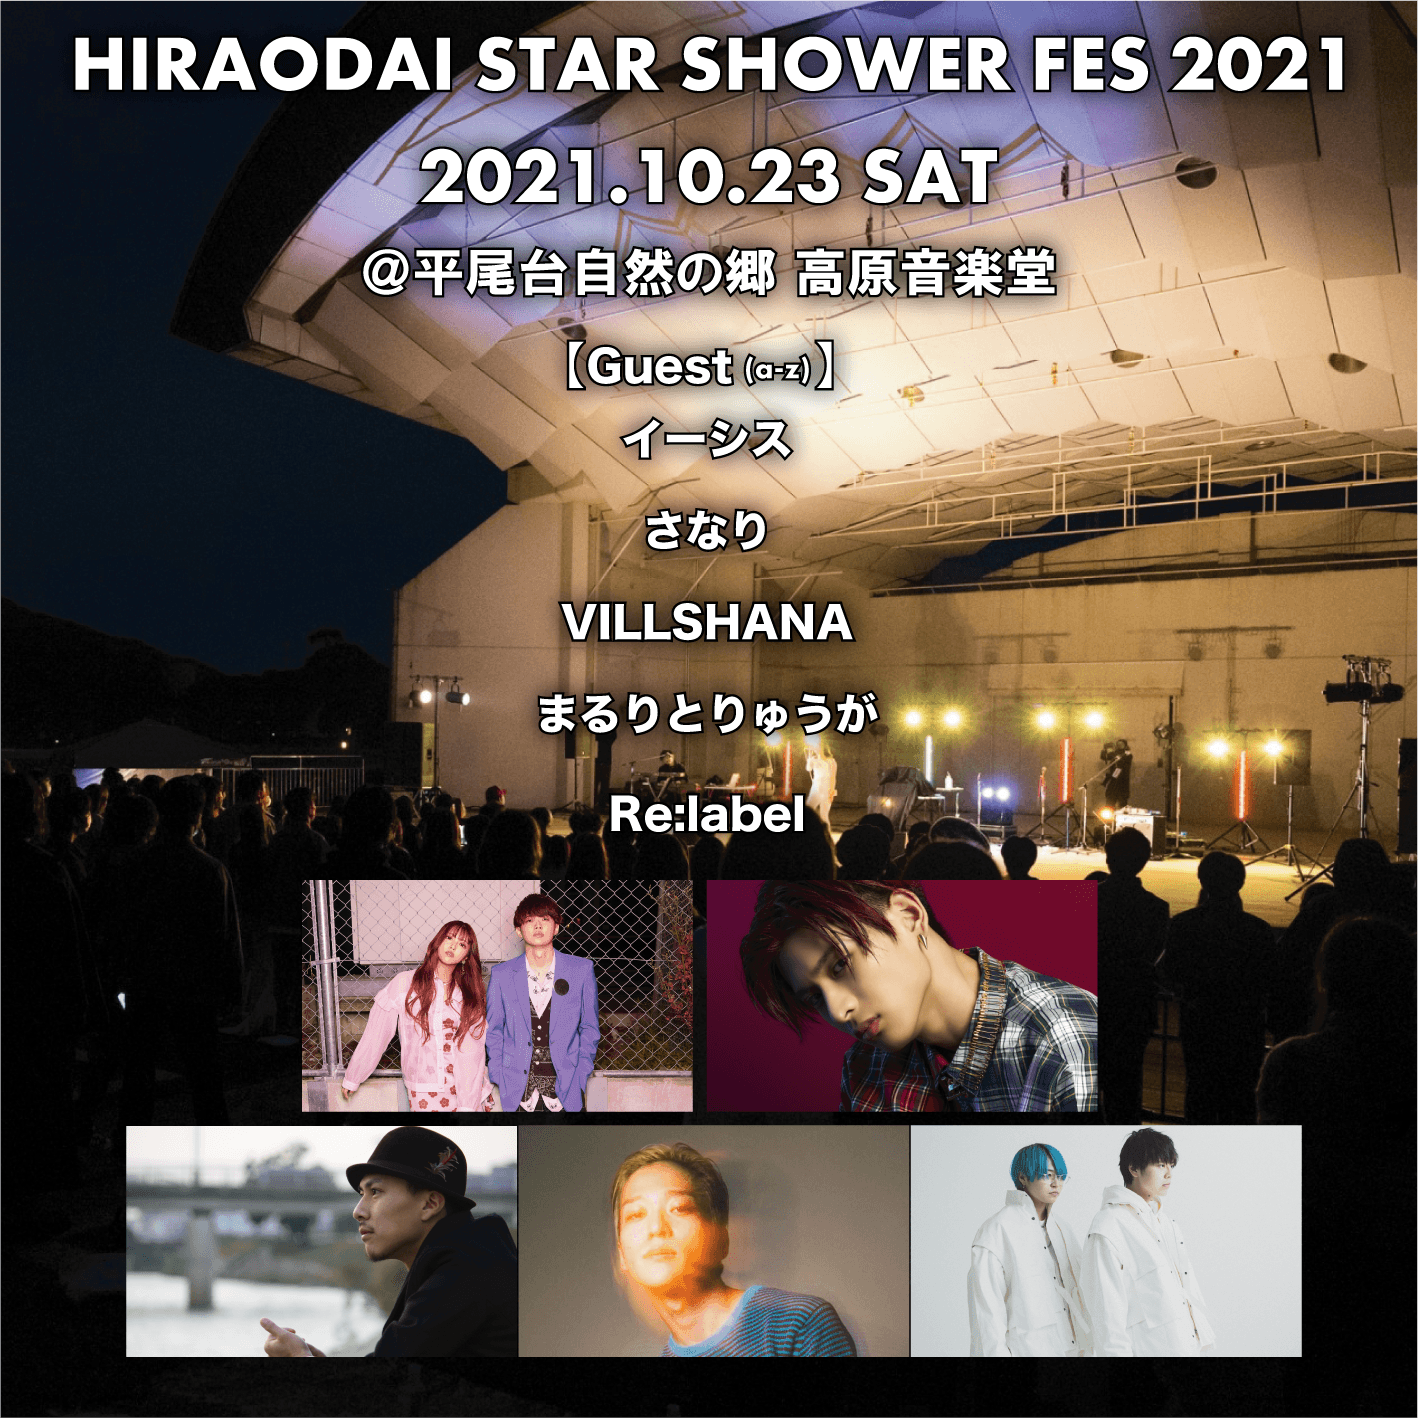 HIRAODAI STAR SHOWER FES 2021 開催決定